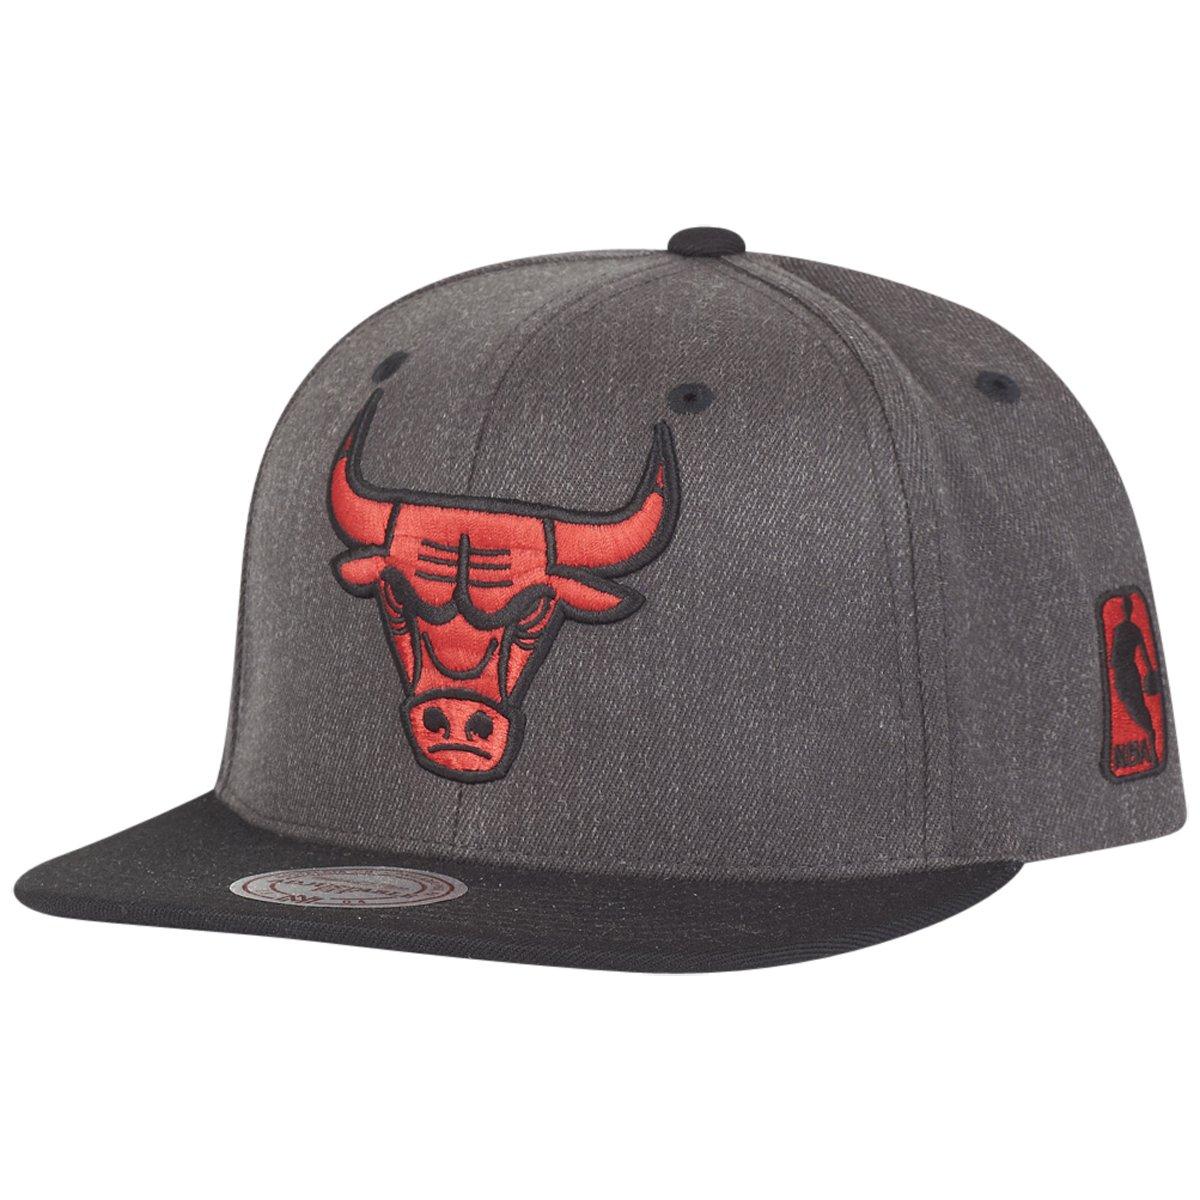 Buy Mitchell   Ness Flexfit 110 Snapback Cap - Chicago Bulls online ... 2b33752b7d6